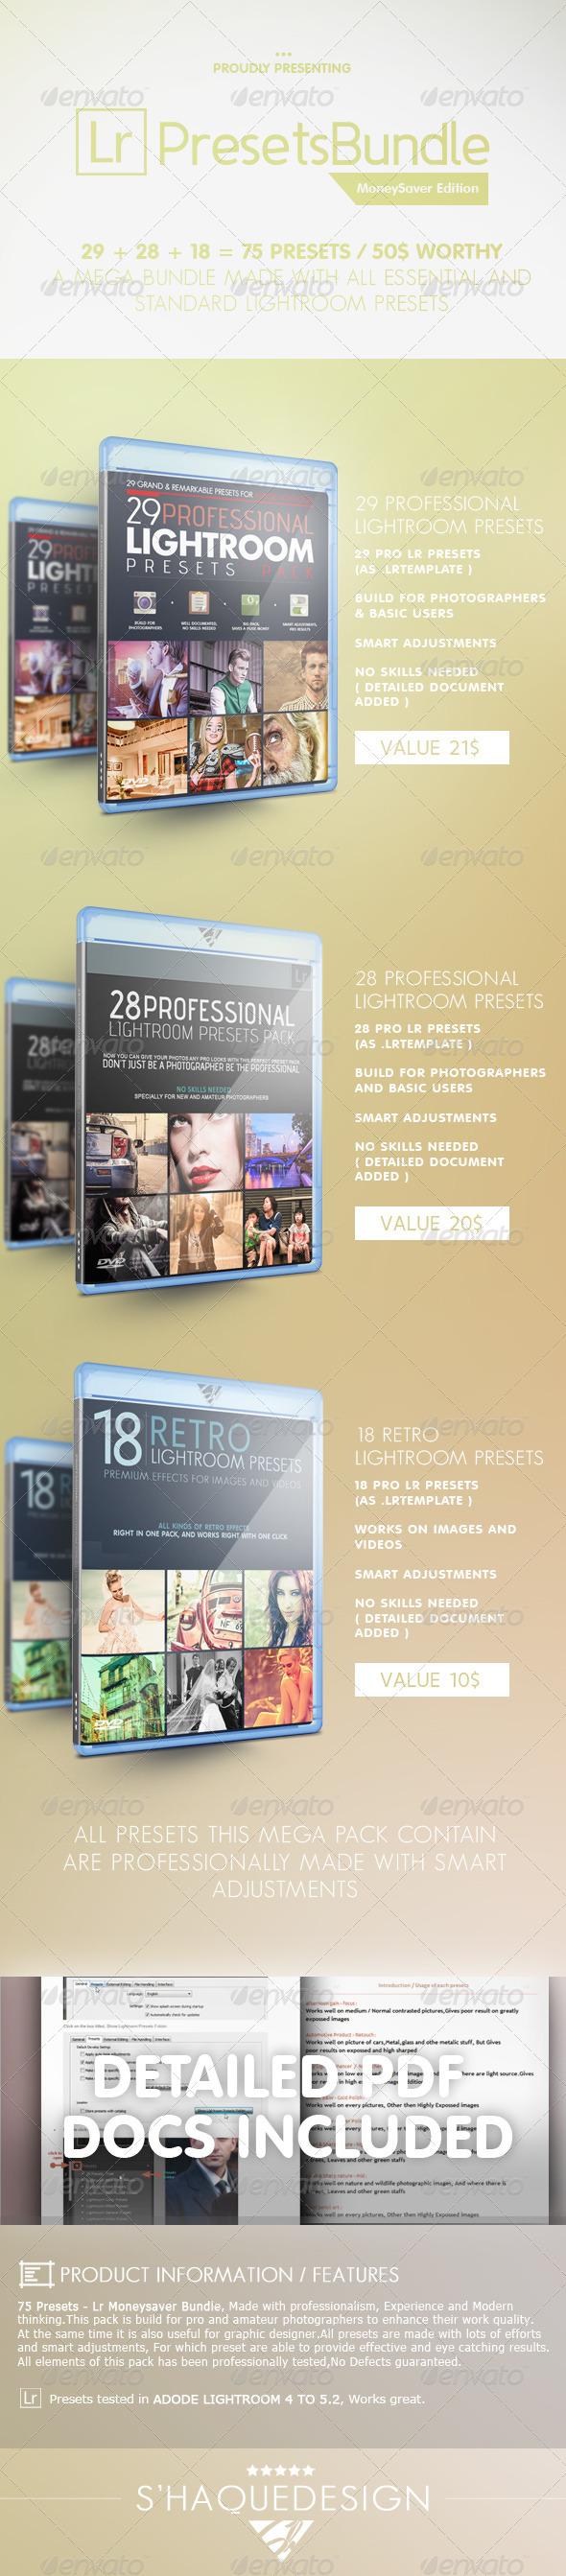 GraphicRiver 75 Pro Presets Mega Lr Presets Bundle 6120274